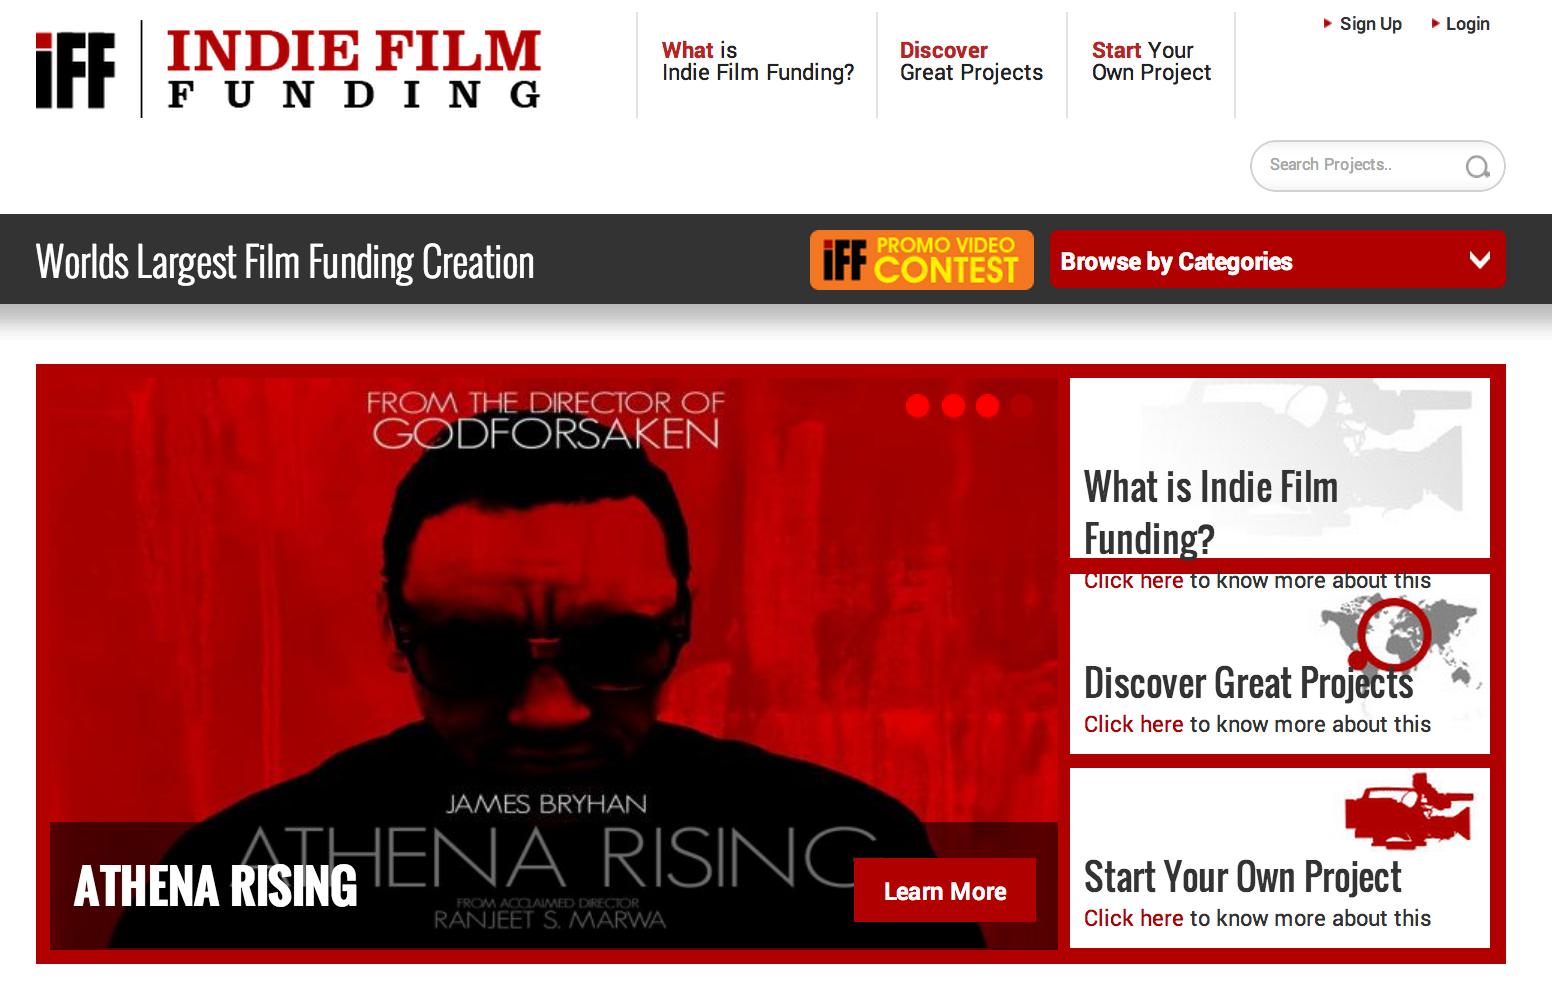 Cinéma Indien et crowdfunding